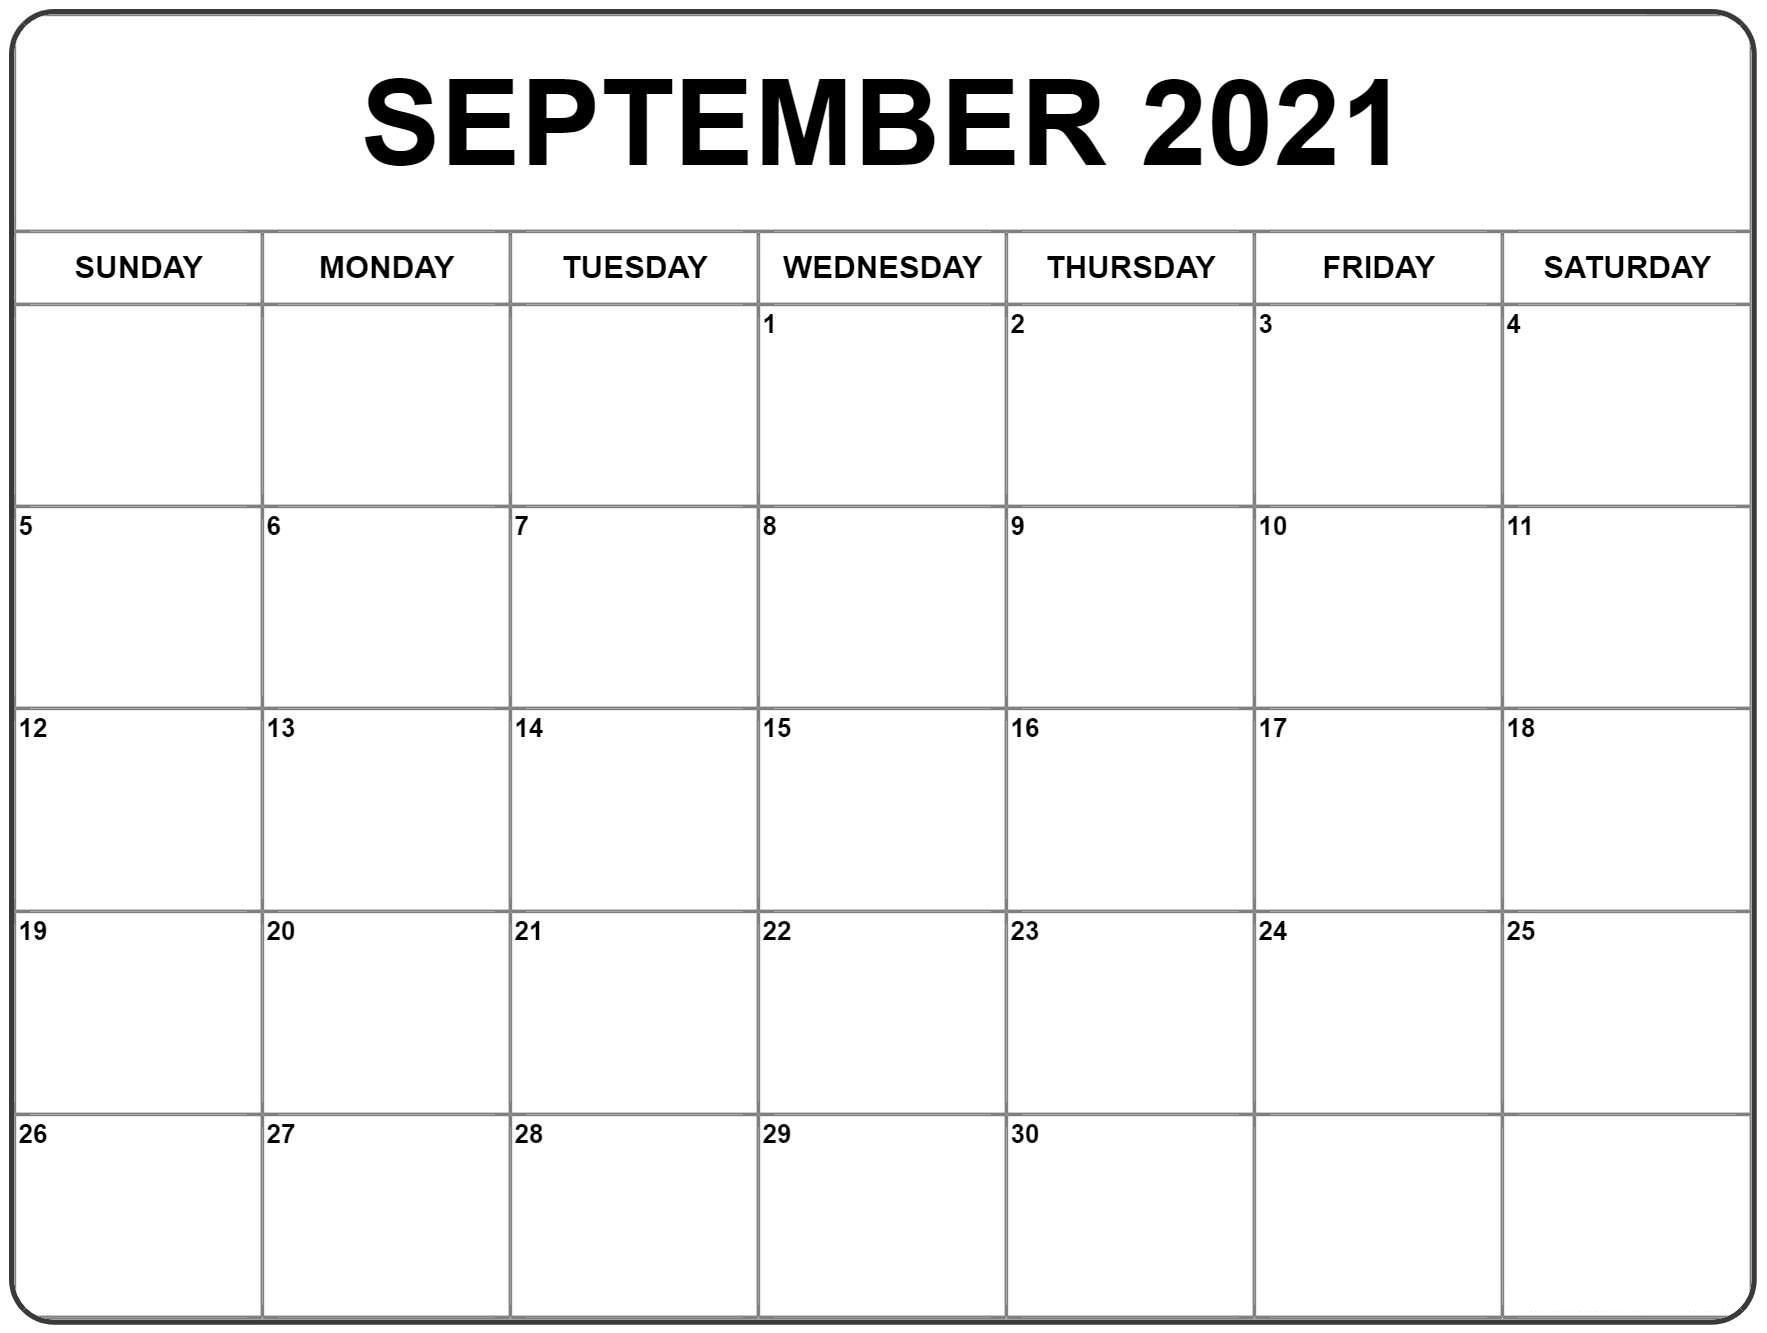 Julian Date 2021 Leap Year   Printable Calendar Template 2021  Julian Code 9197 For 2021